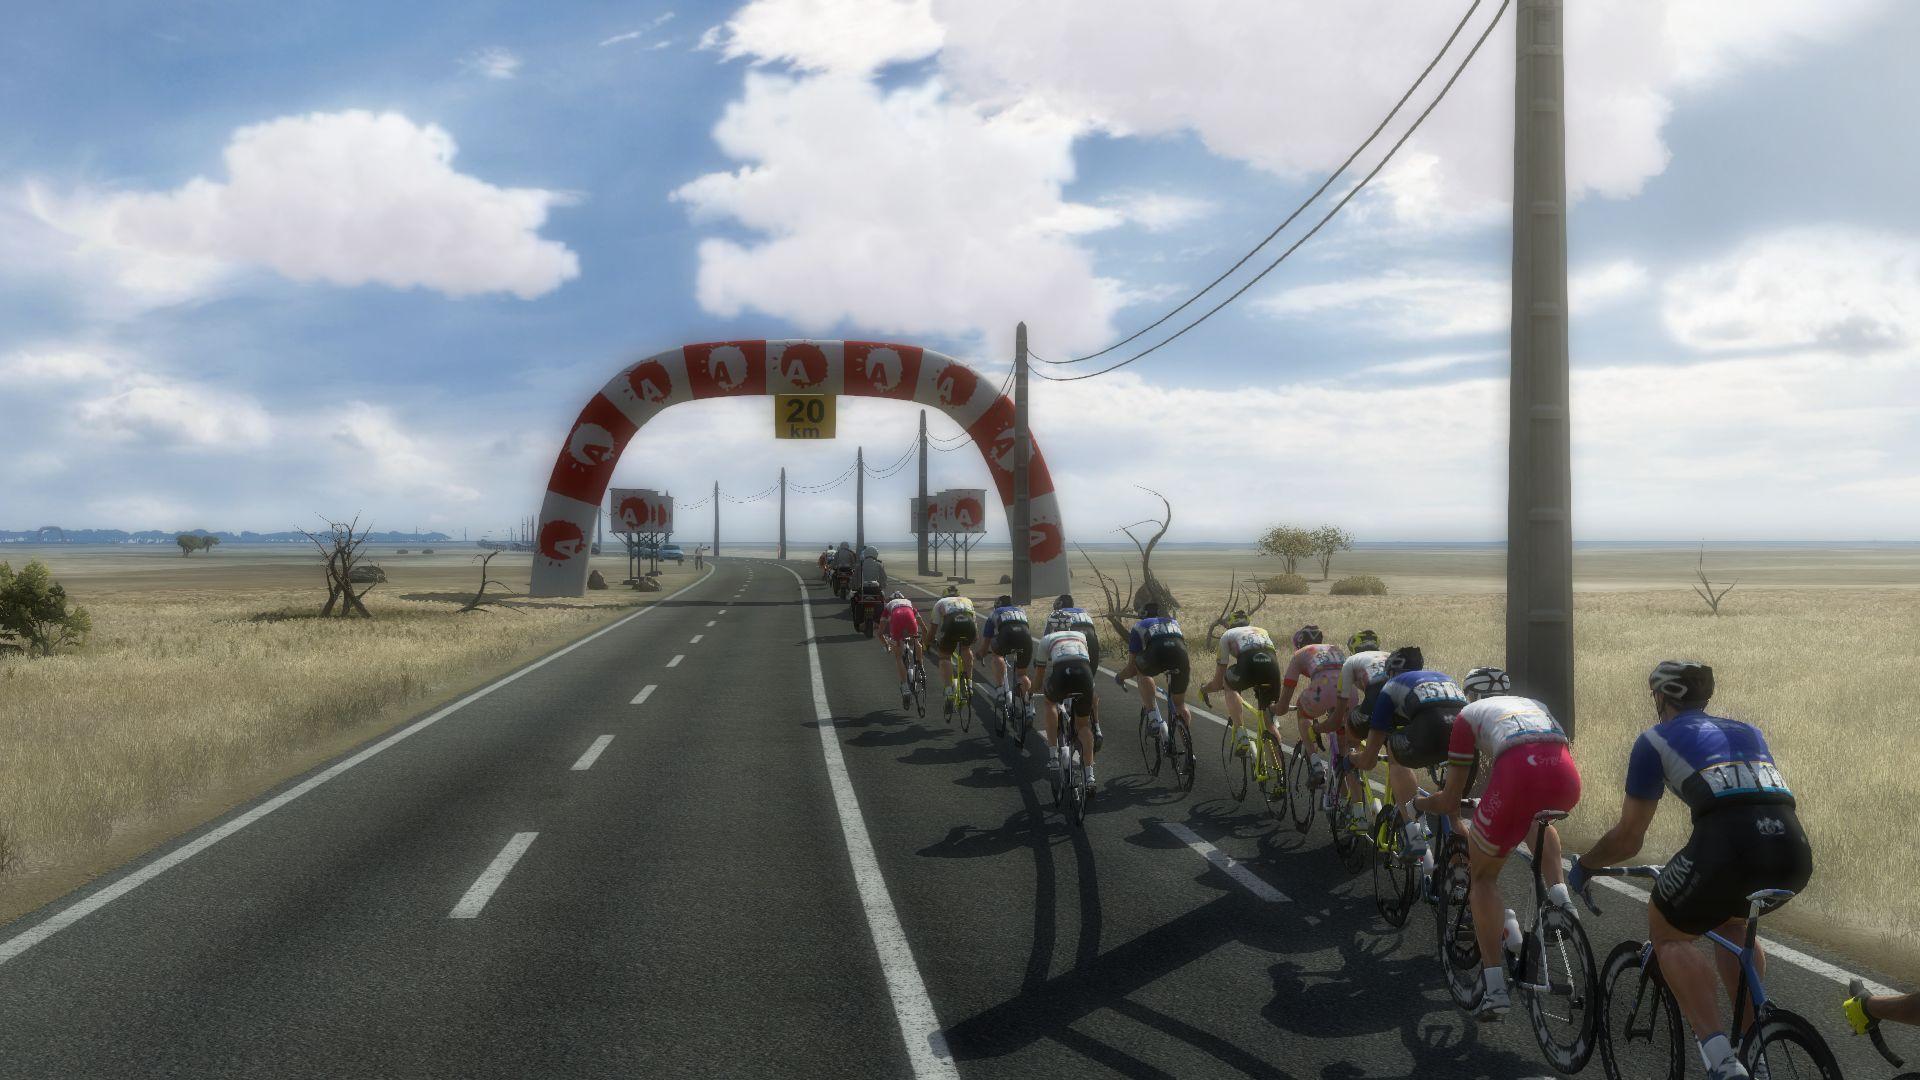 pcmdaily.com/images/mg/2019/Races/PT/Qatar/mg19_qat_s04_10.jpg